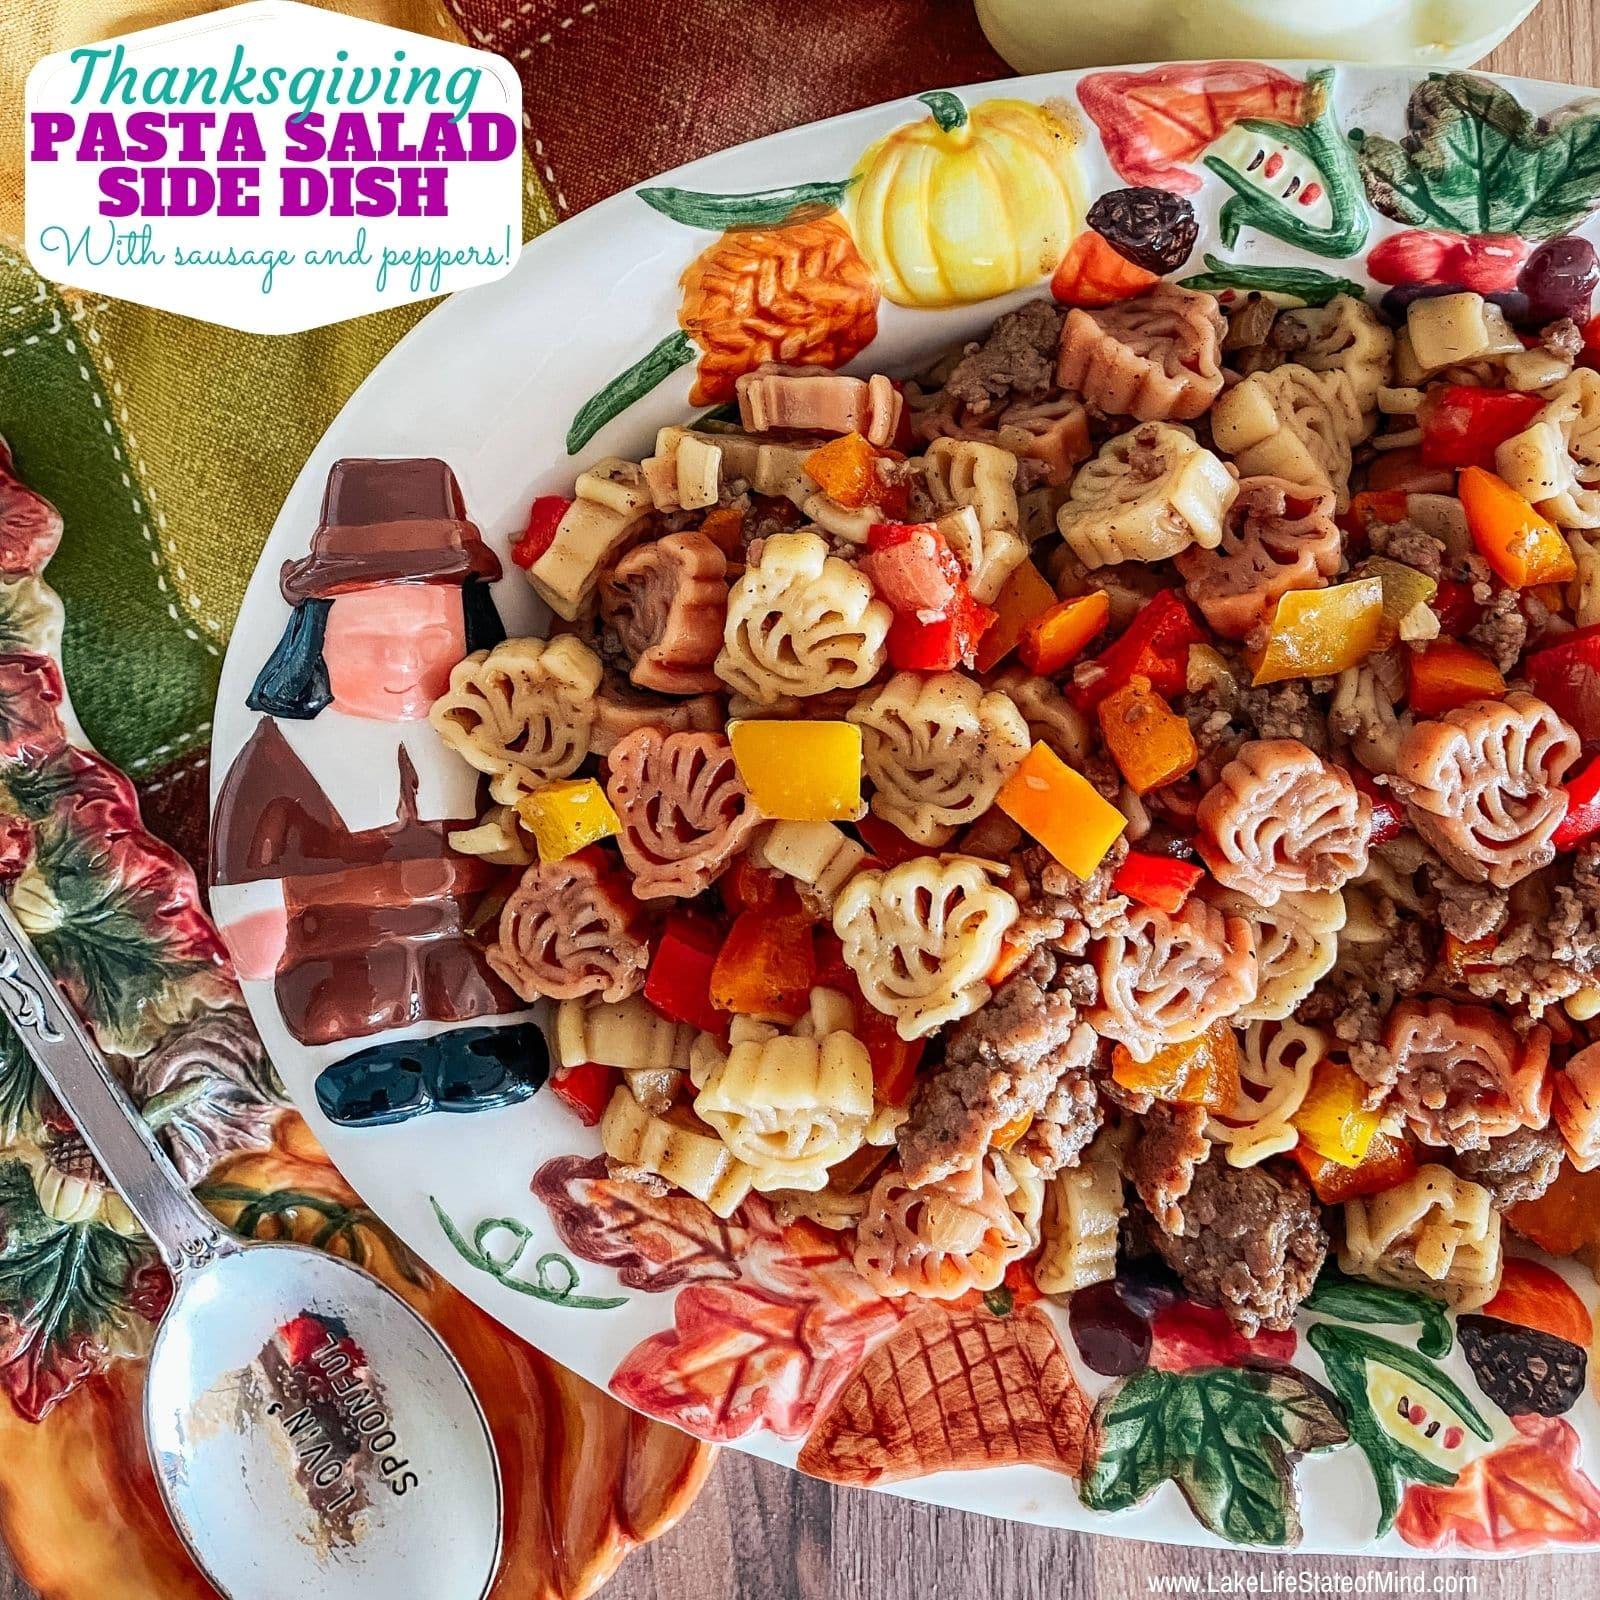 Turkey Shaped Pasta Salad with Sausage